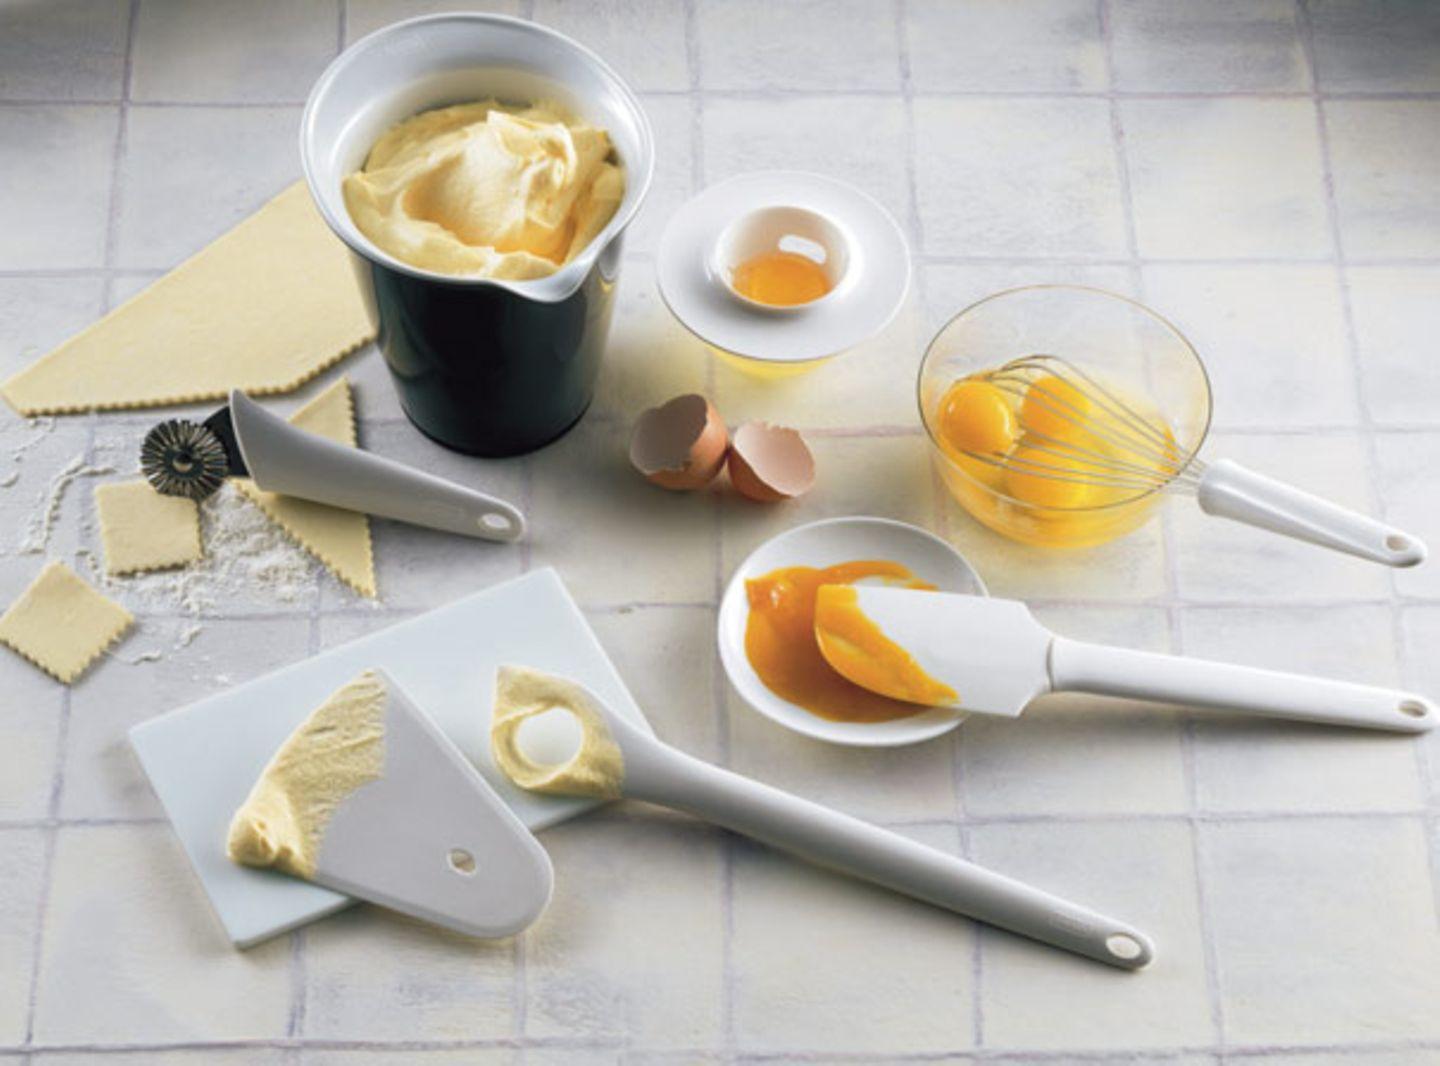 Endlos backen: Pâtisserie-Set